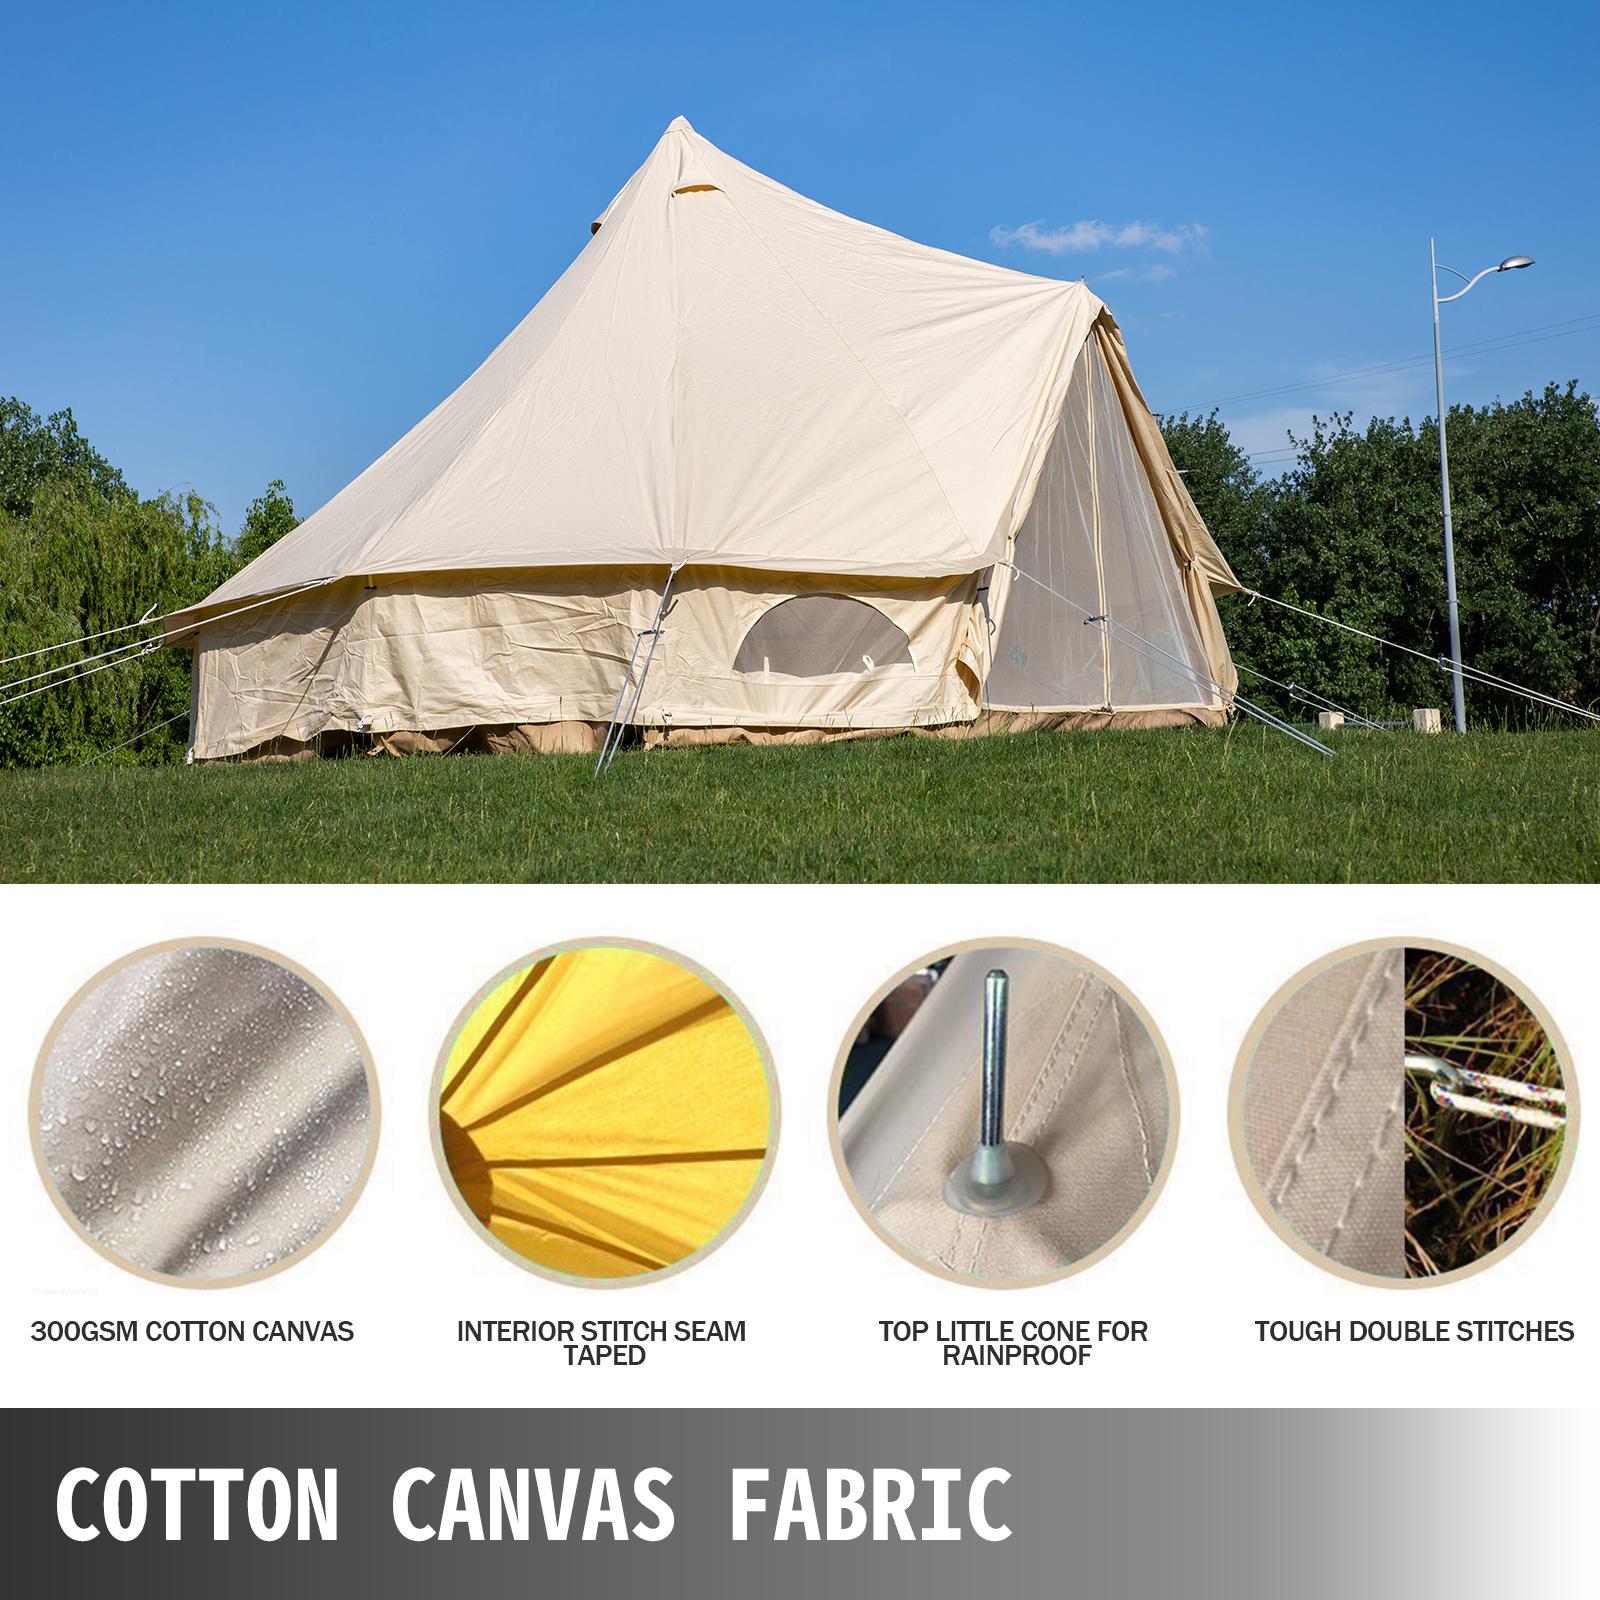 4-Season-Bell-Tent-3-4-5-6M-Waterproof-Cotton-Canvas-Glamping-Camping-Beach-US thumbnail 14